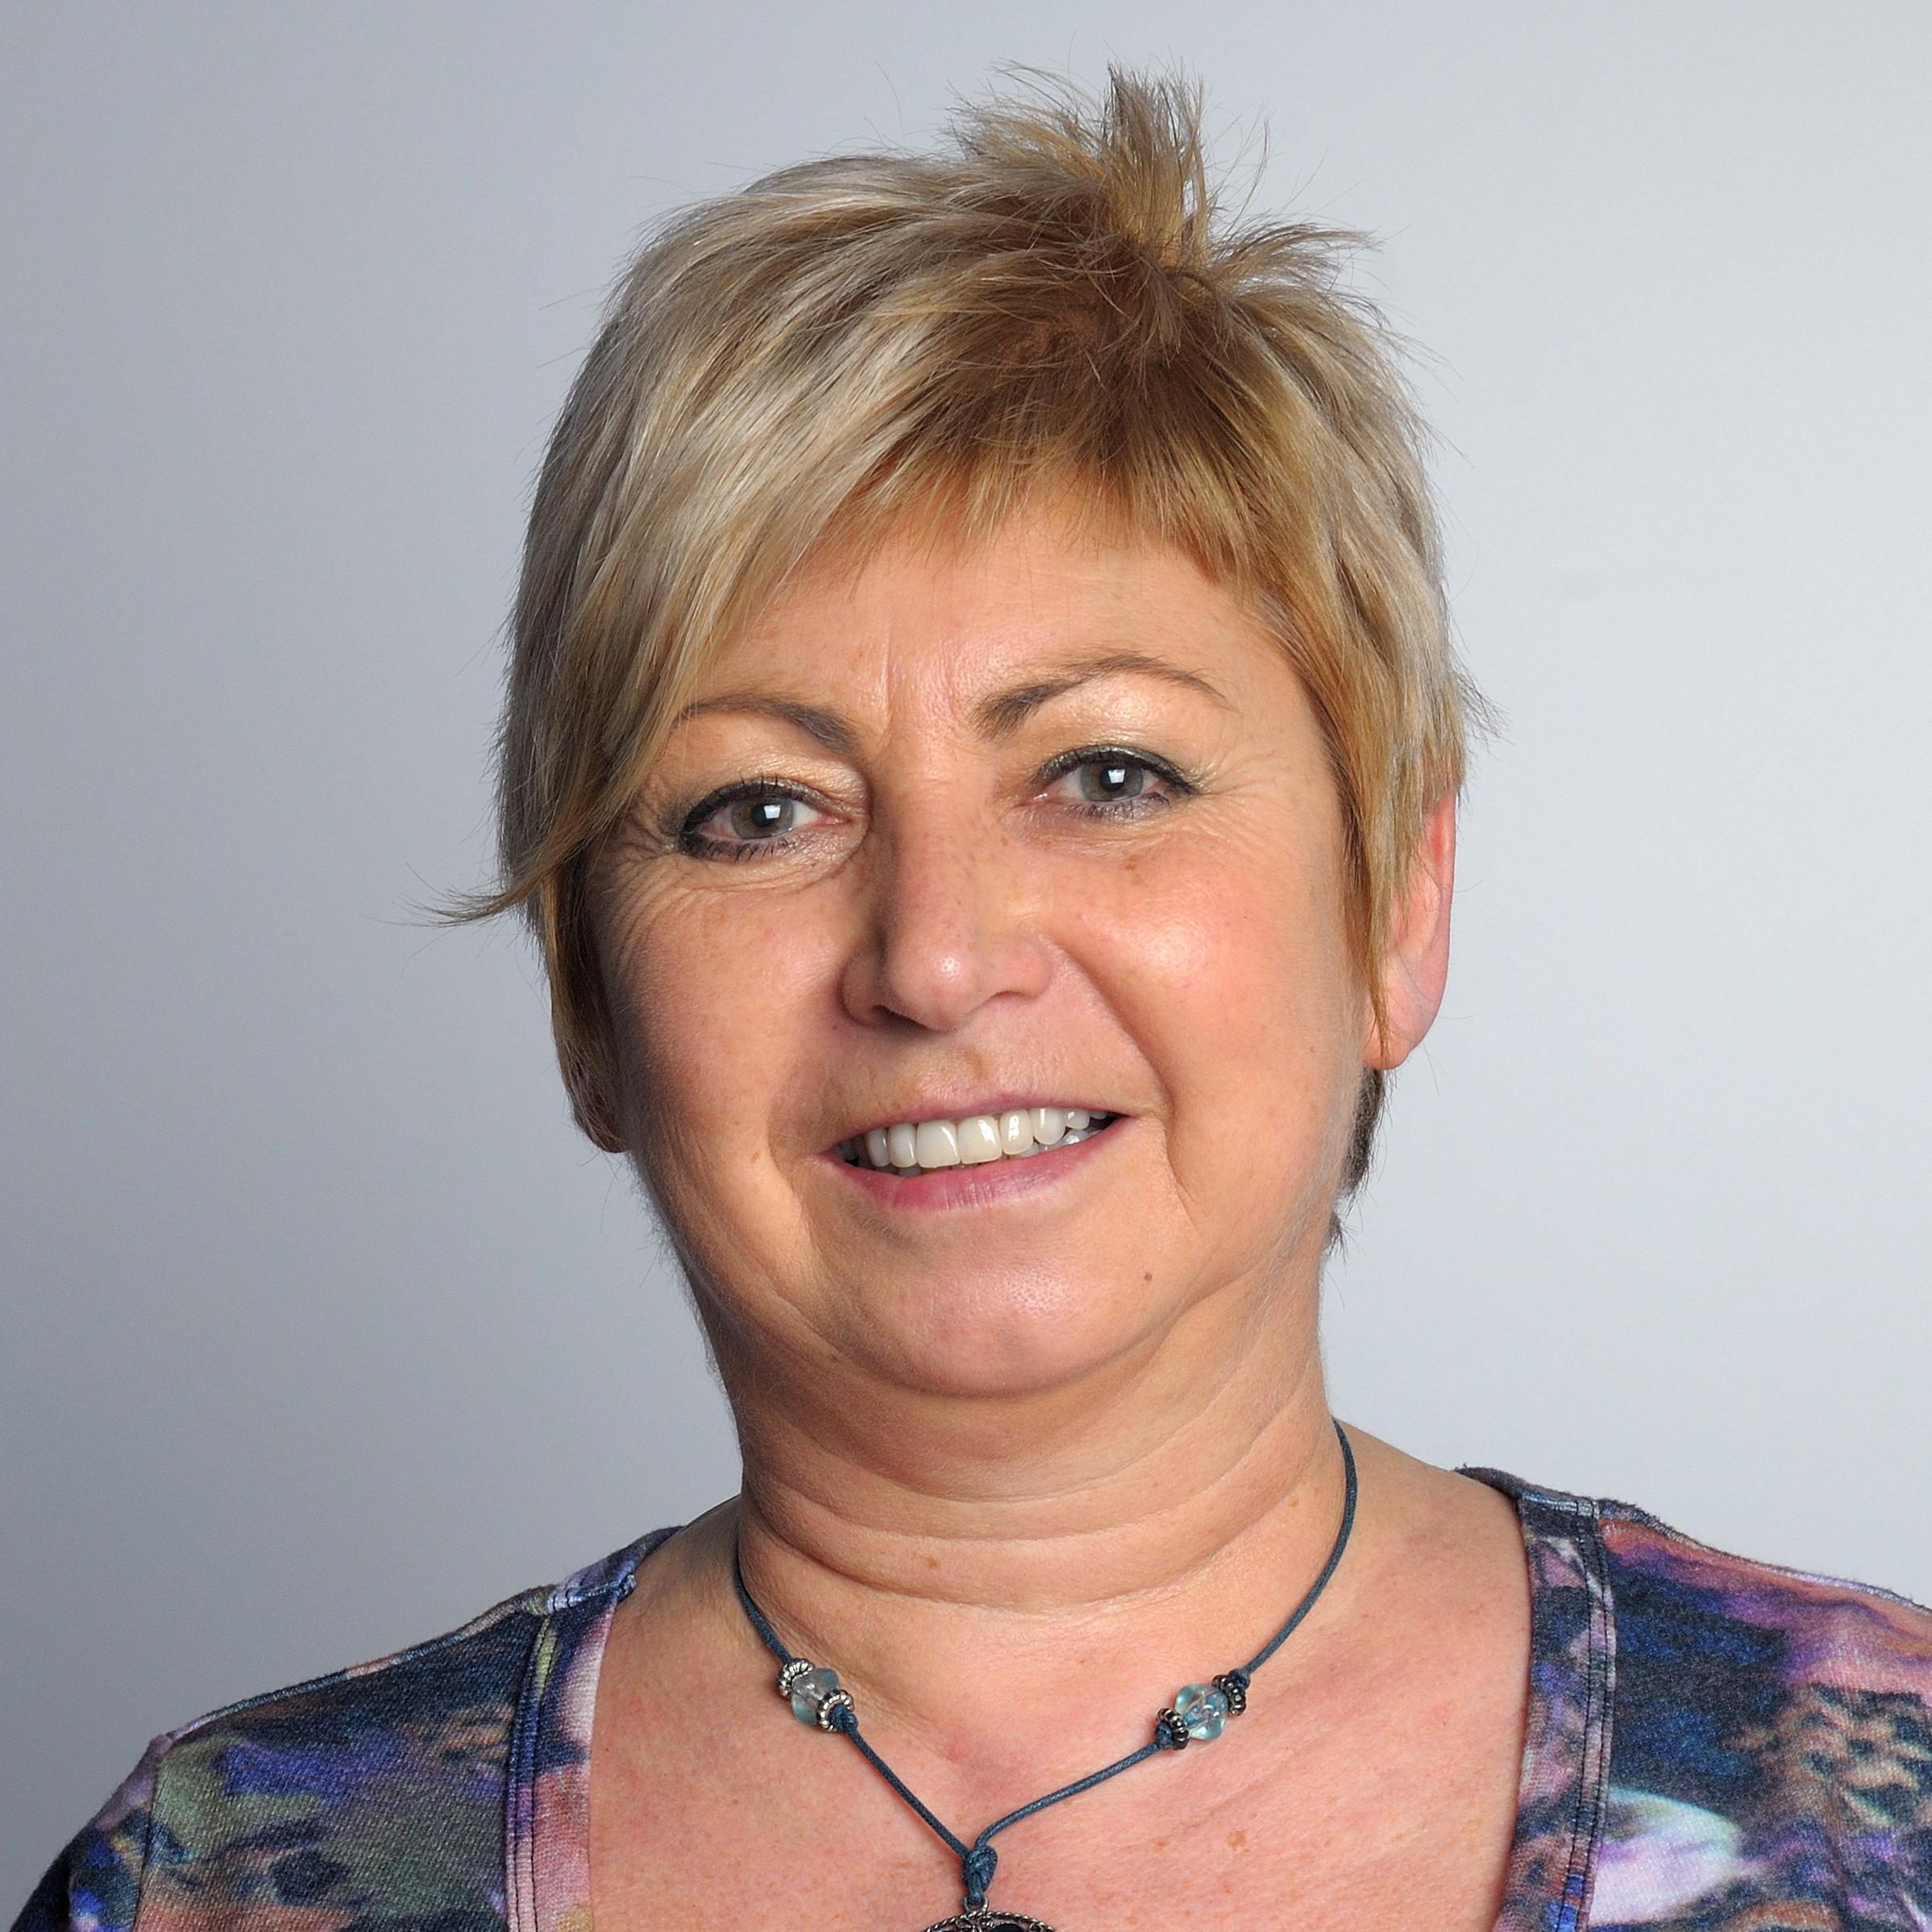 Sonia Oliviers